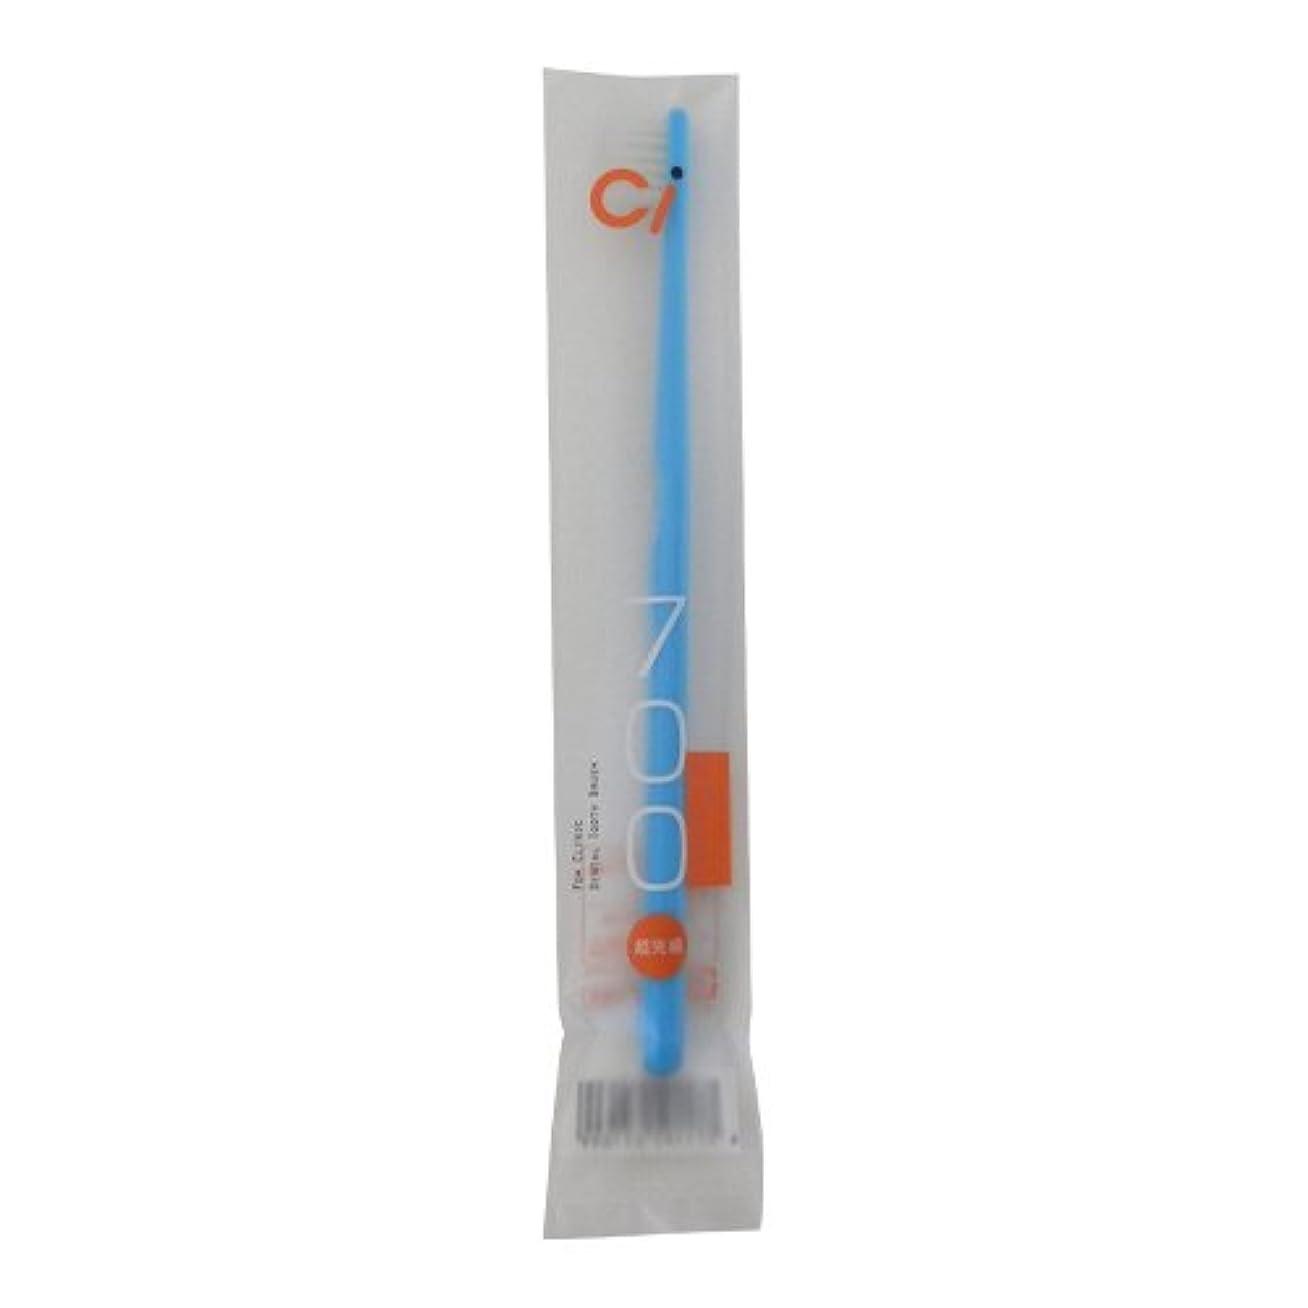 Ciメディカル Ci700 超先細 ラウンド毛 歯ブラシ 1本 (Mふつう)(ブルー)